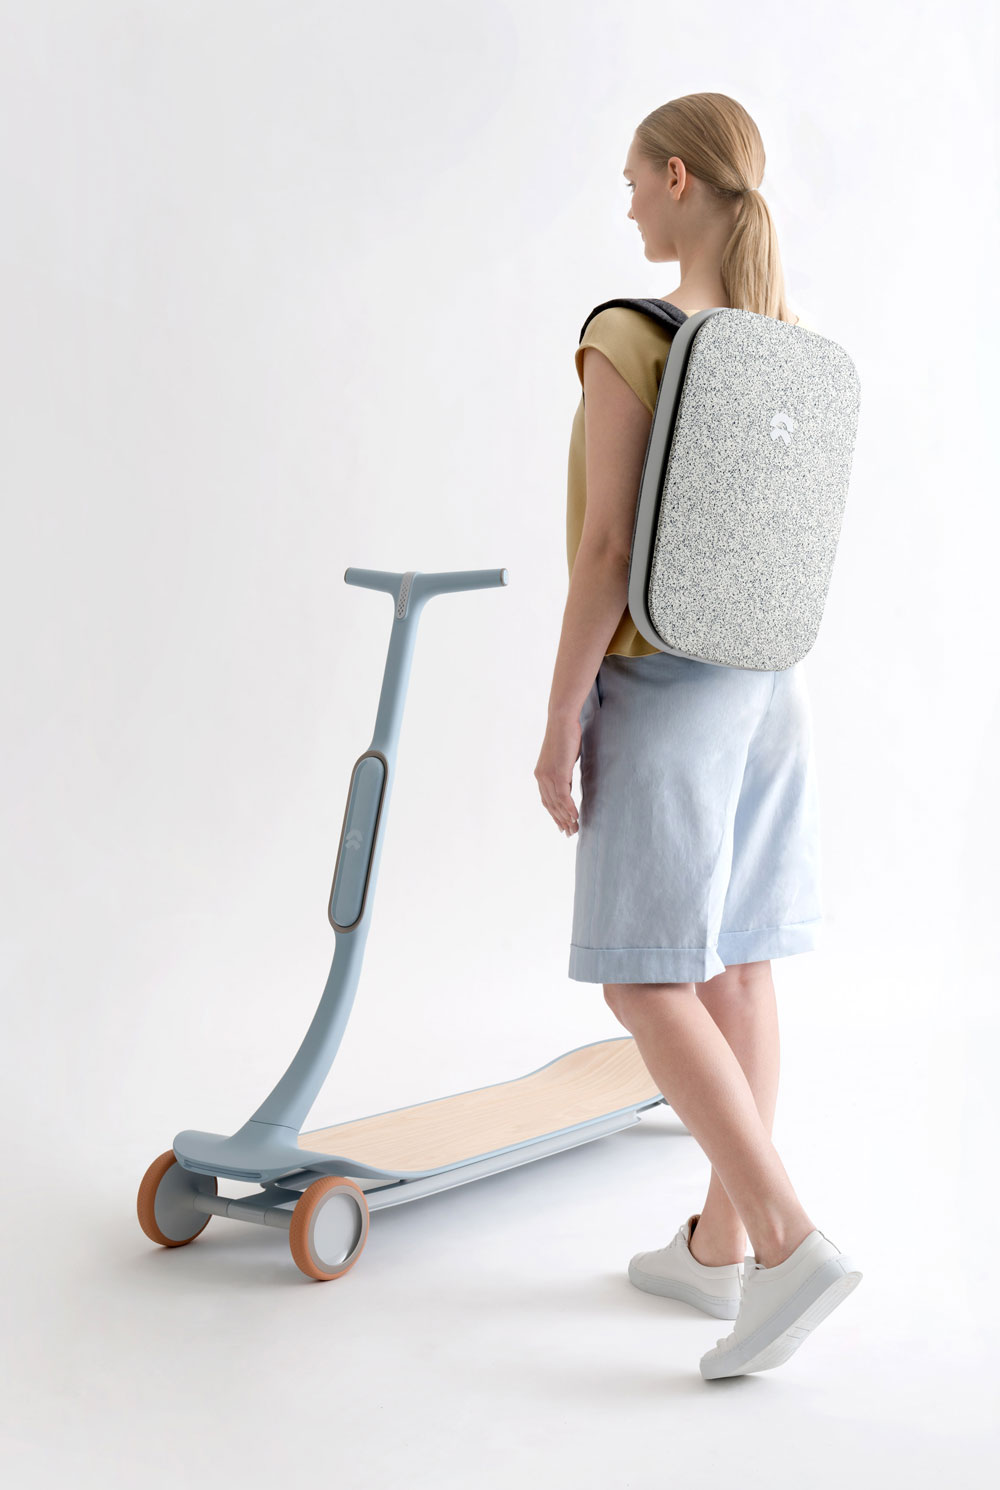 layer-nio-pal-scooter-design-visual-atelier-8.jpg